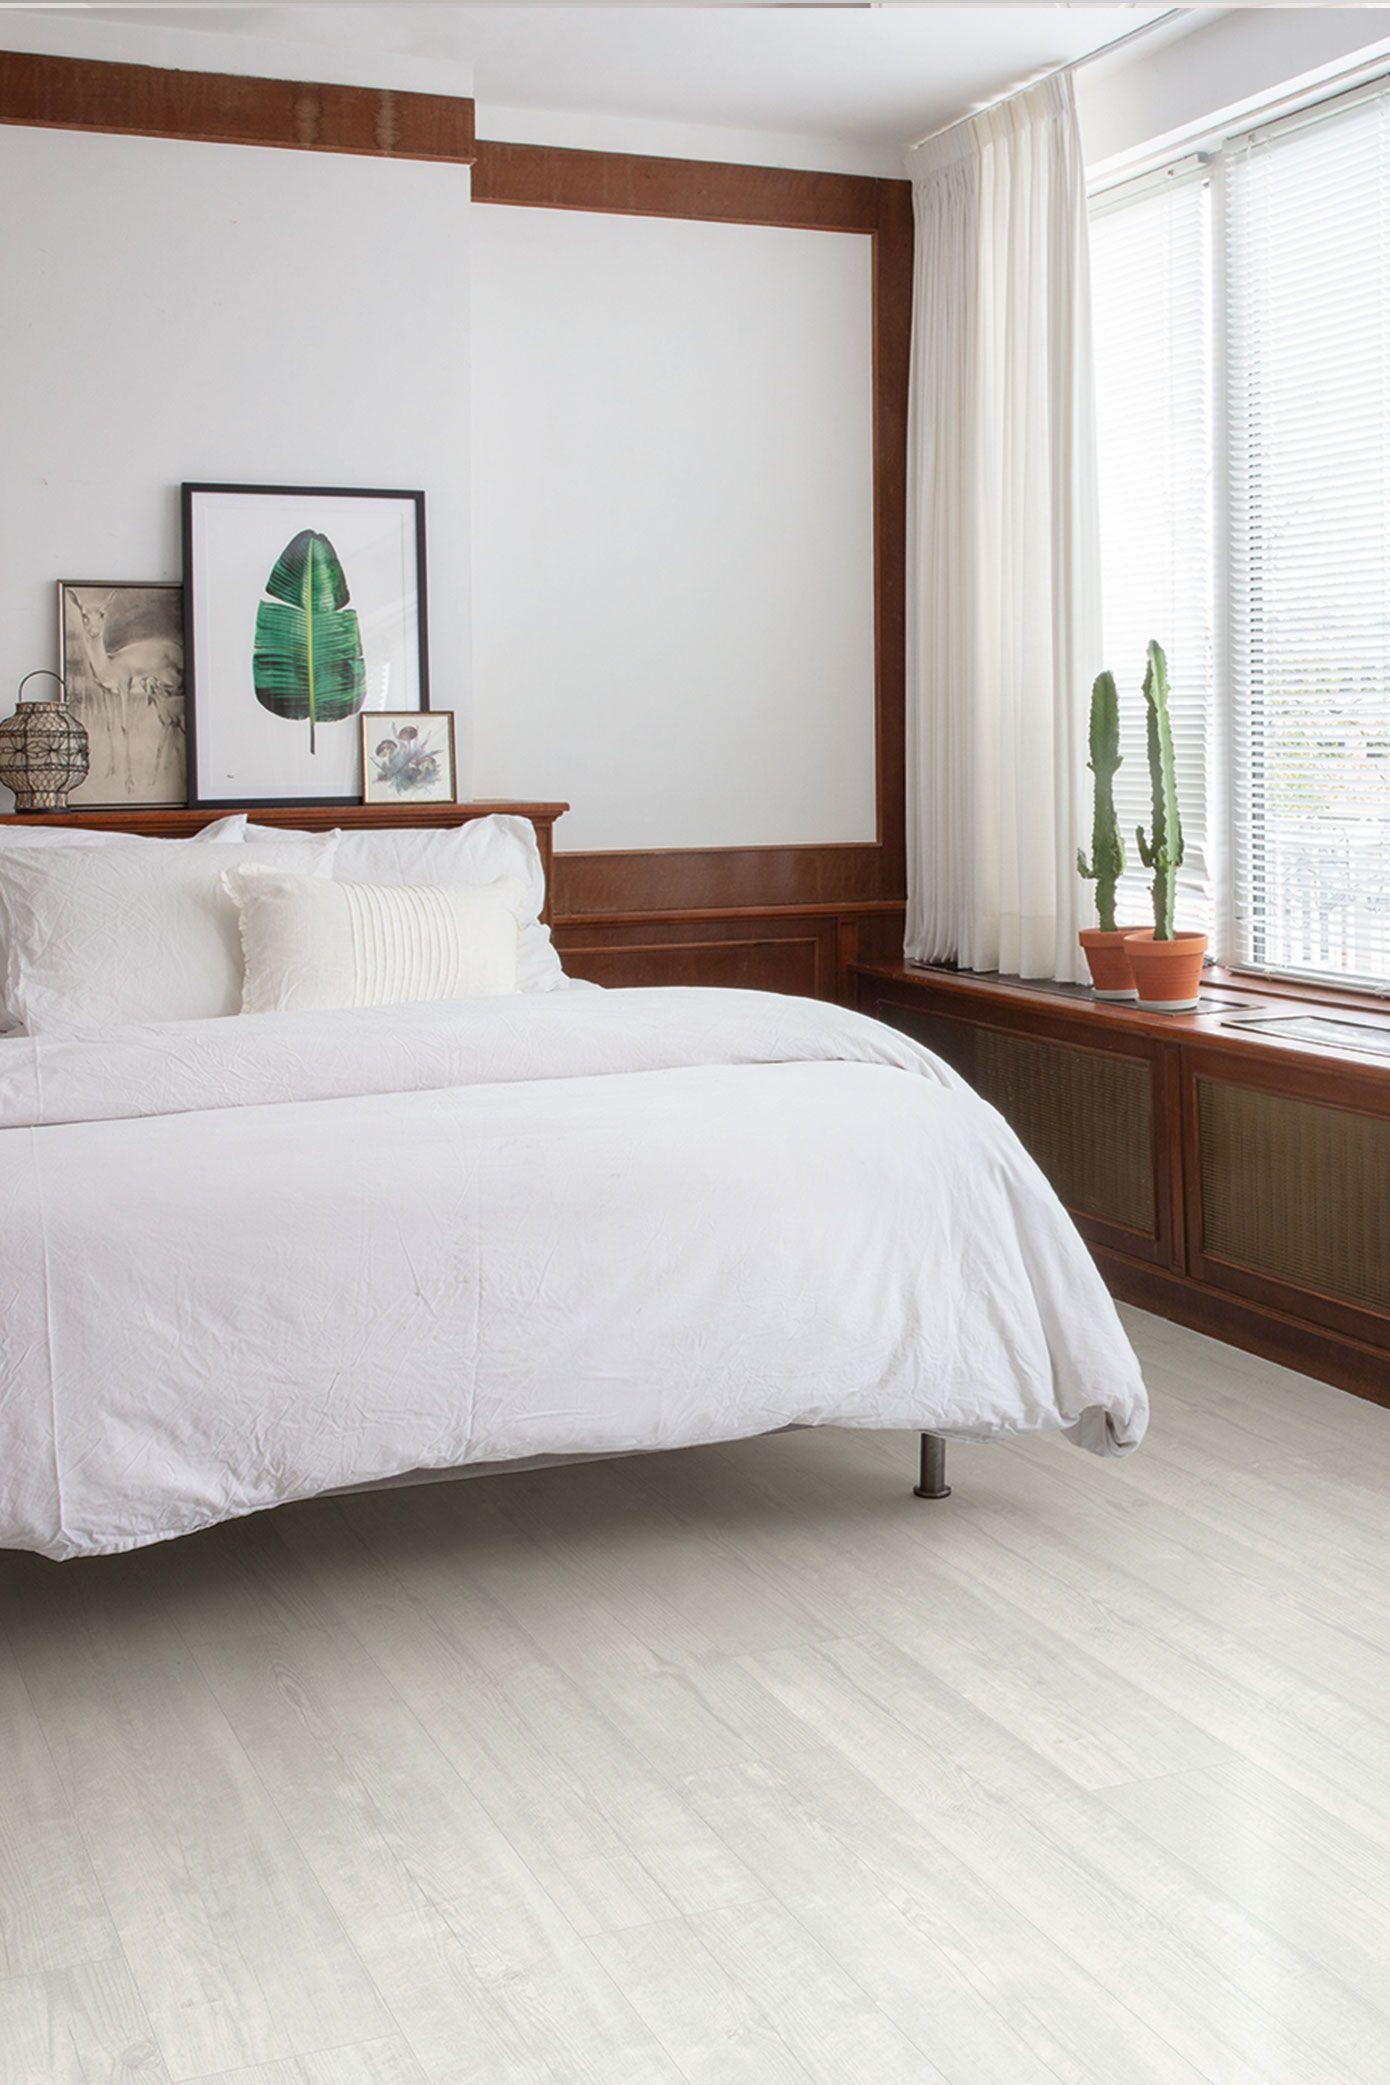 9 BEDROOM flooring inspiration ideas  bedroom flooring, perfect